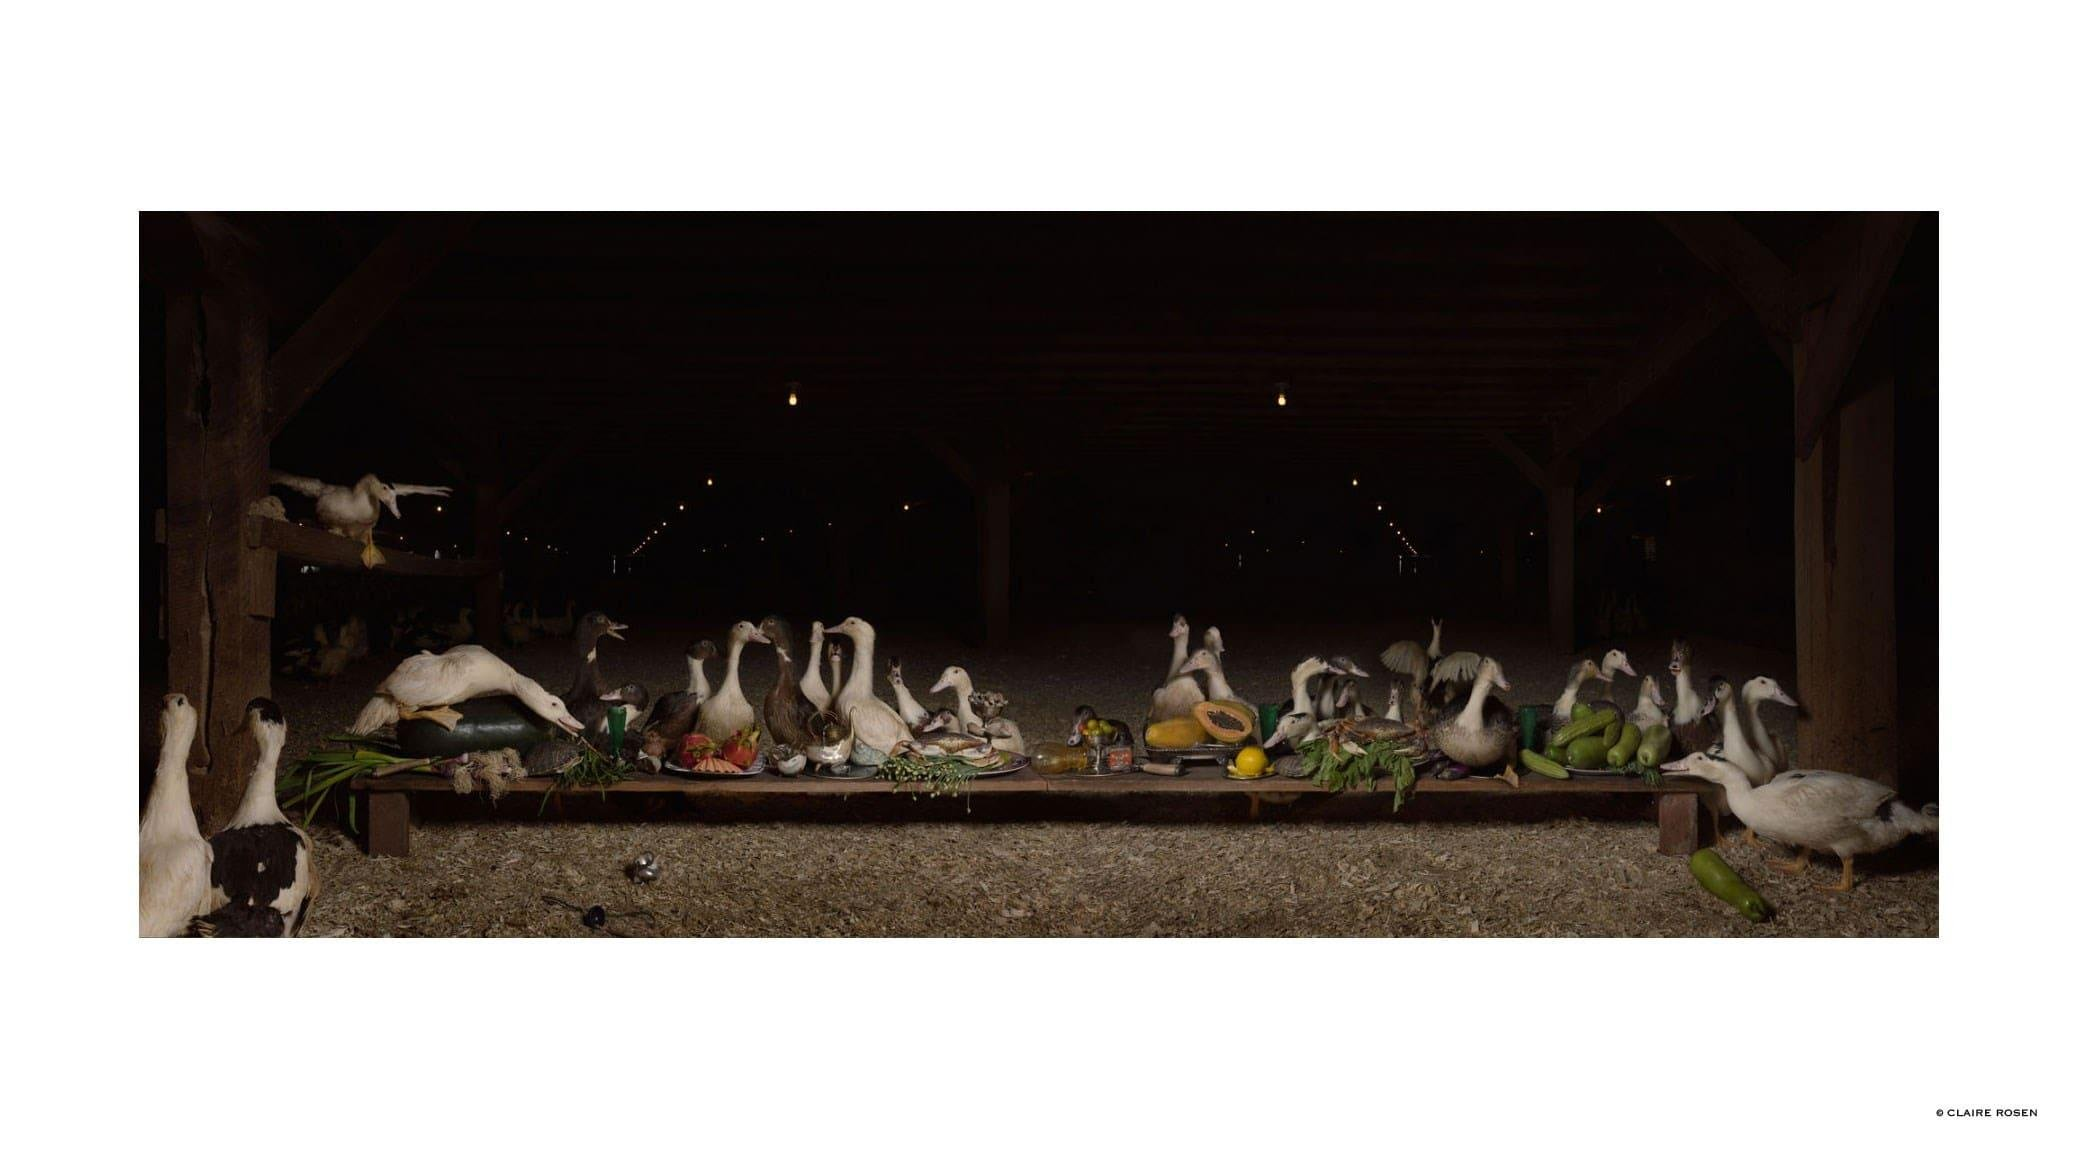 original_ducks-claire-rosen-finedininglovers.jpg